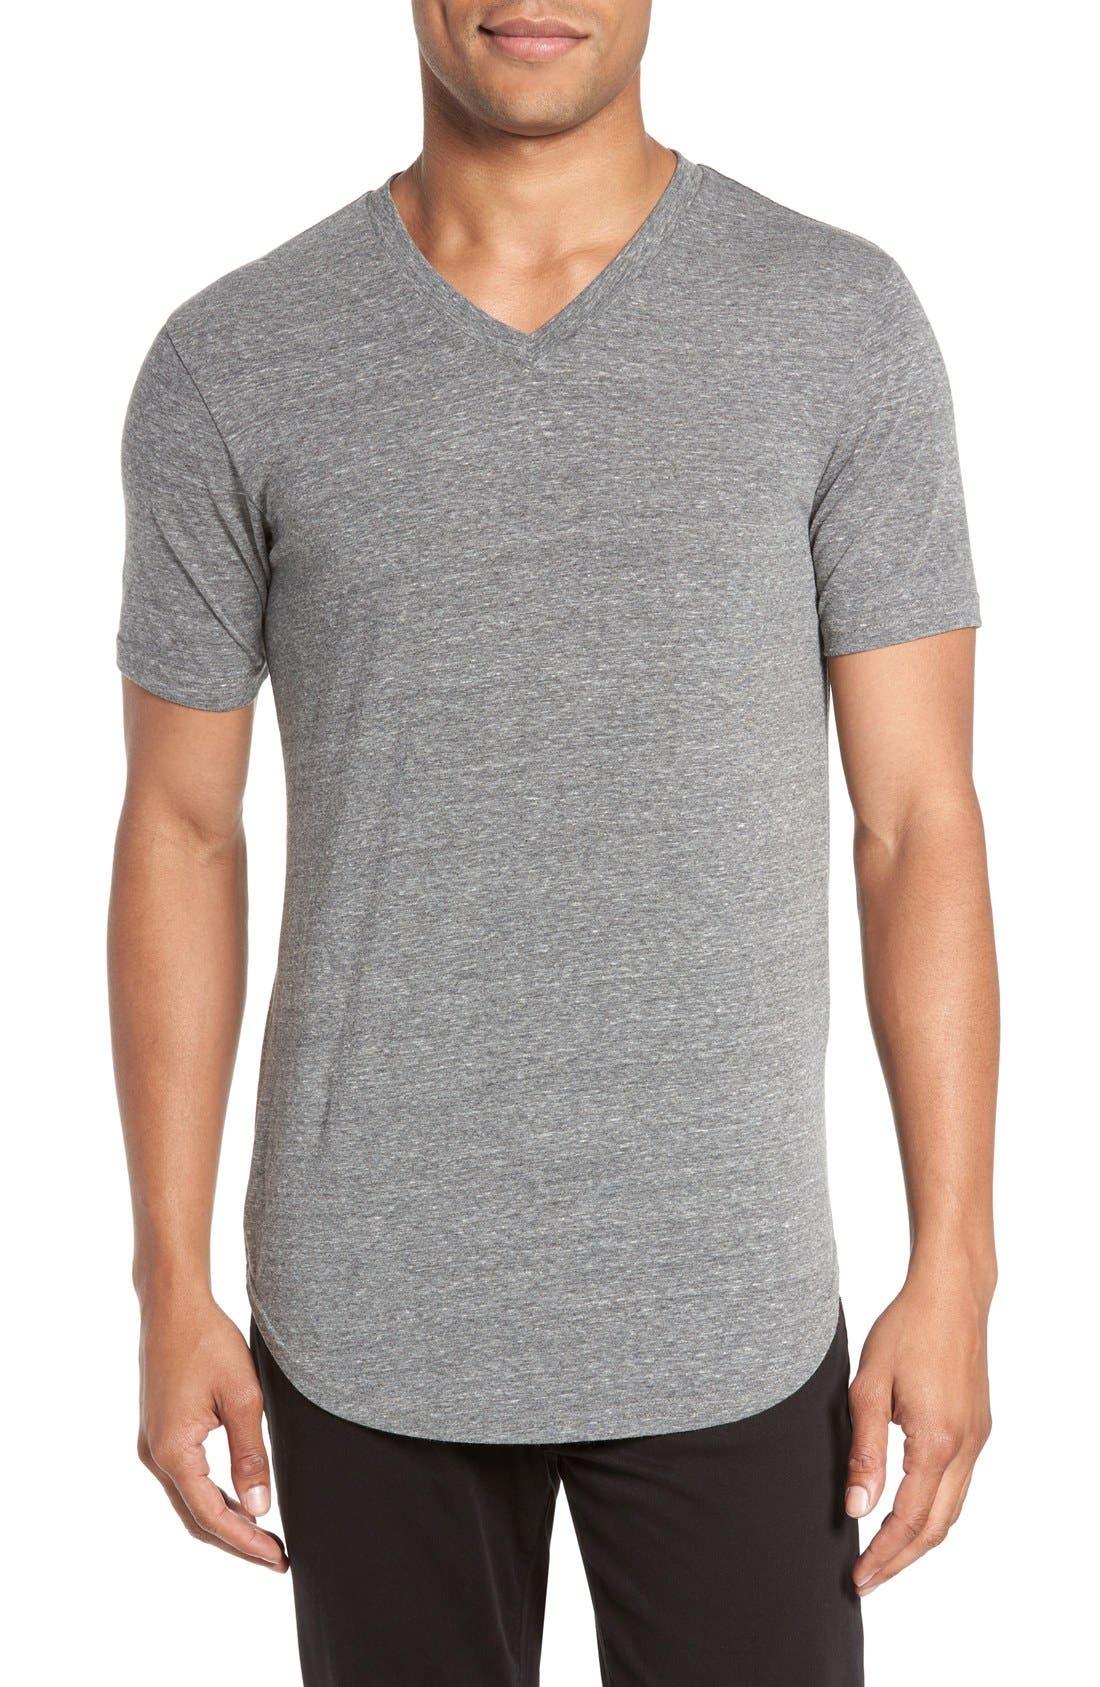 Scallop Triblend V-Neck T-Shirt,                             Main thumbnail 1, color,                             HEATHER GREY